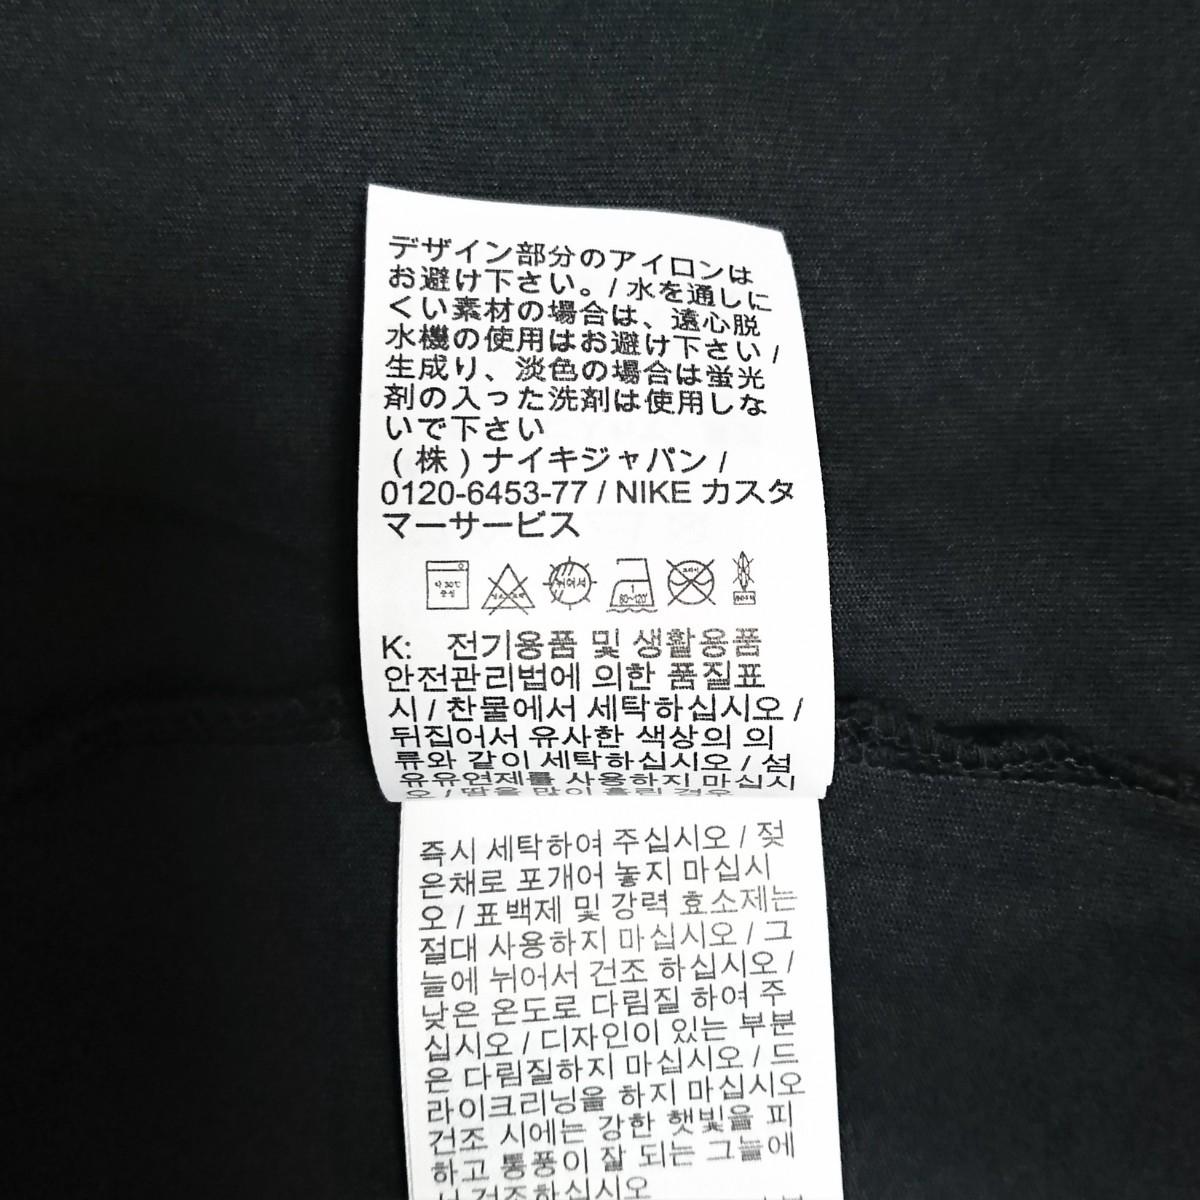 NIKE ナイキ タンクトップ ノースリーブシャツ レディース M